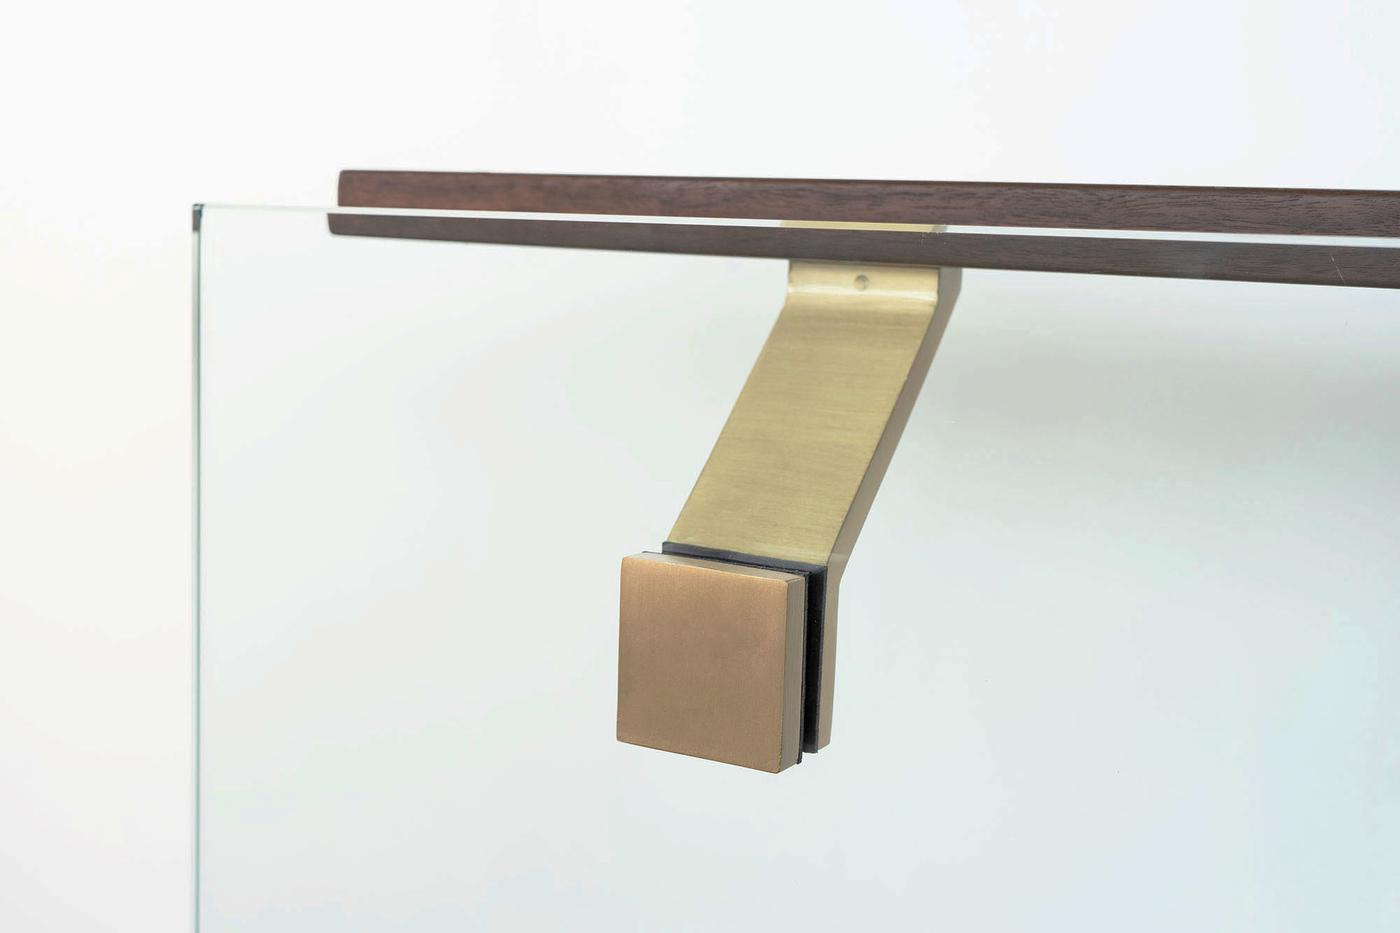 Modern-brass-glass-mounted-handrail-bracket